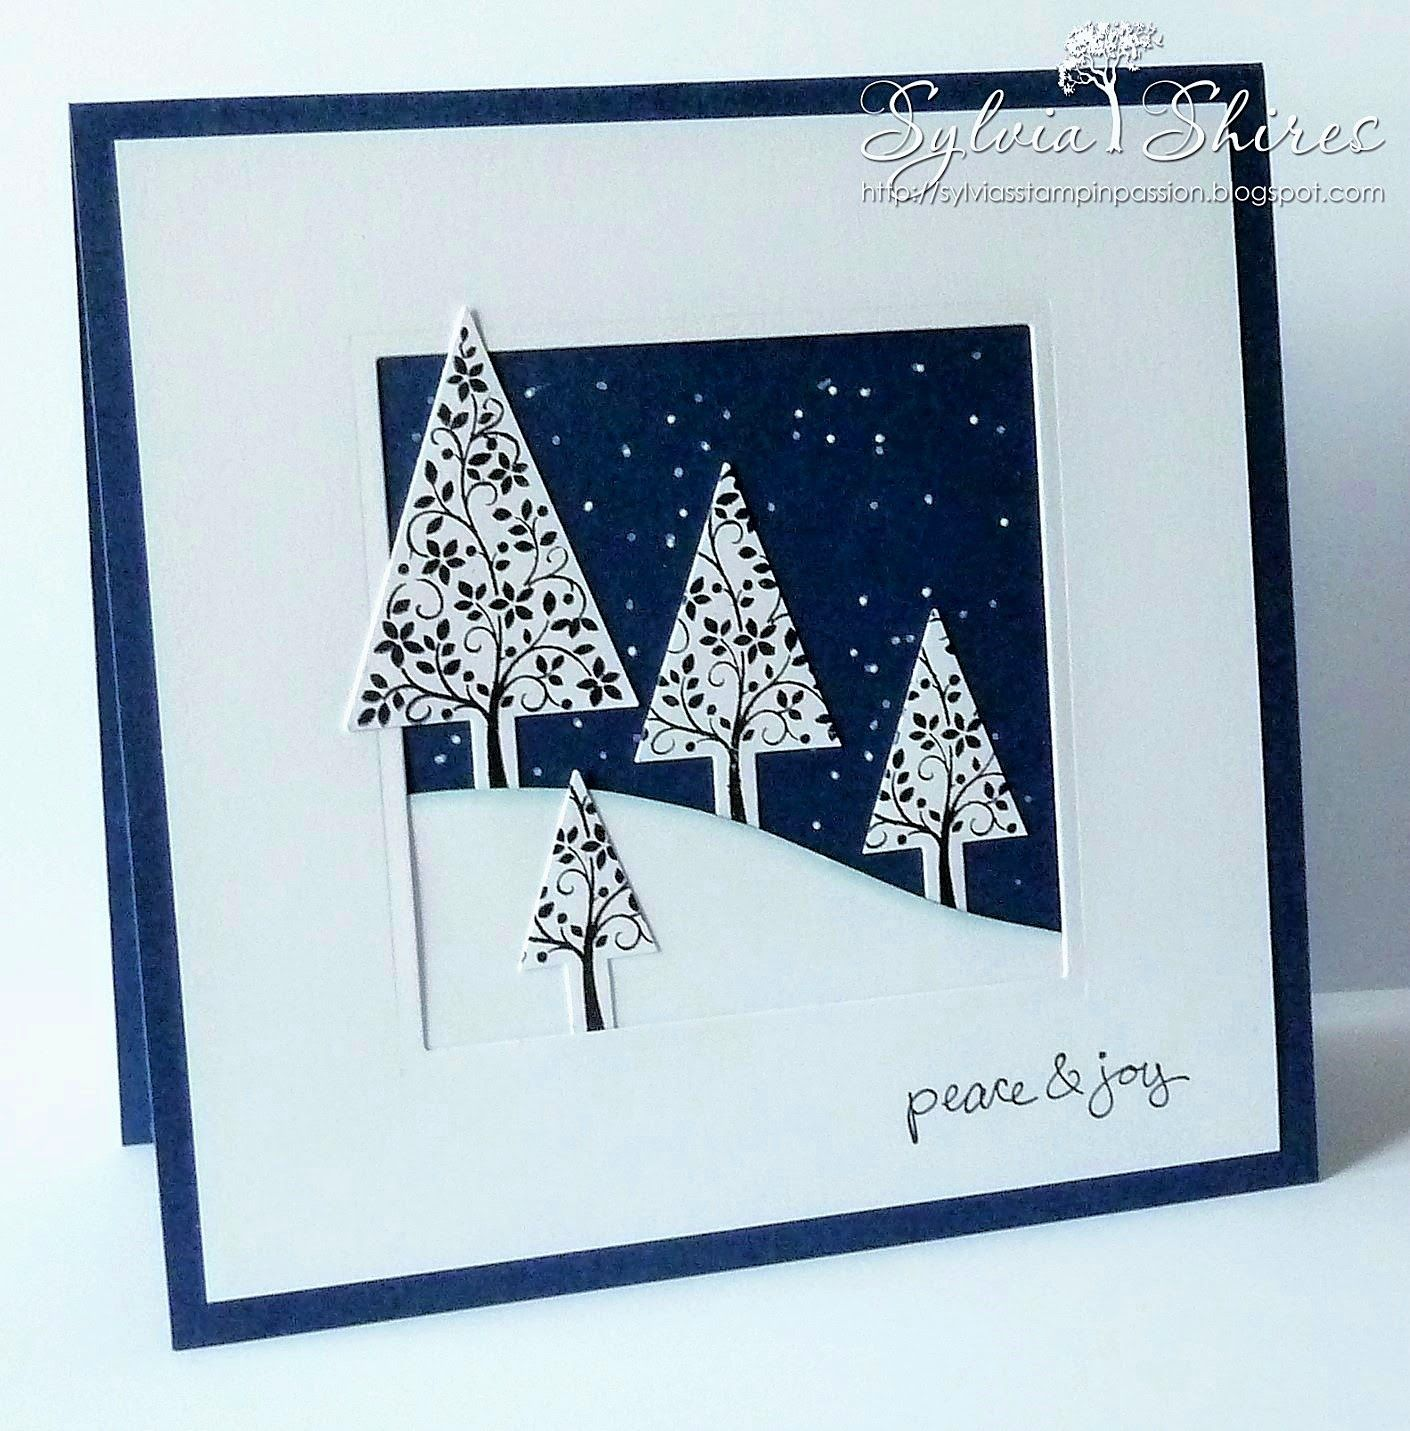 Sylvias Stampin Passion Christmas Cheer At Stampin Up Cards